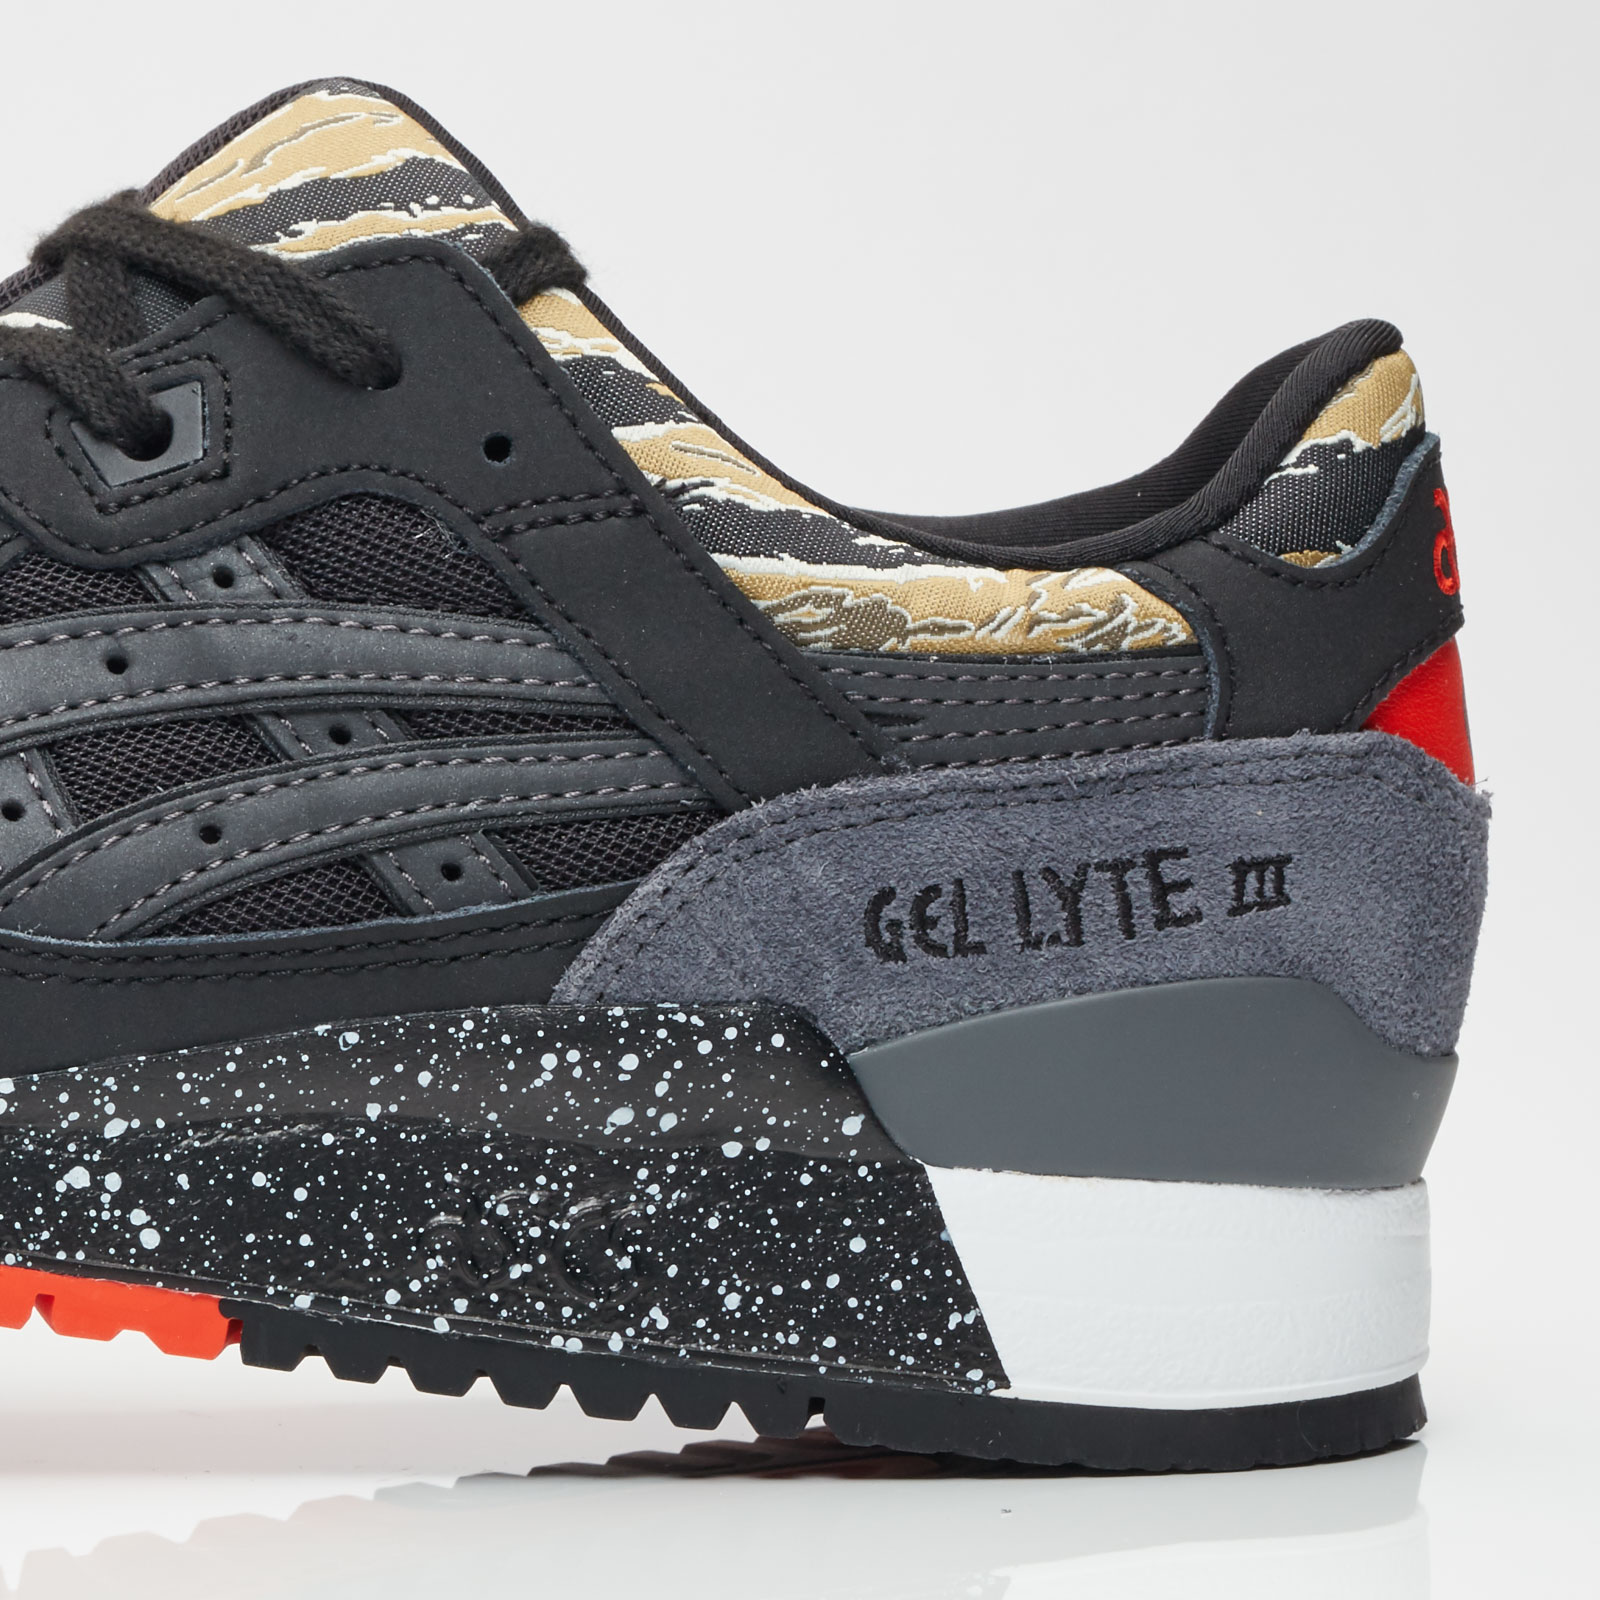 online retailer 72b91 5afe1 ASICS Tiger Gel-Lyte III - H7y0l-9090 - Sneakersnstuff ...